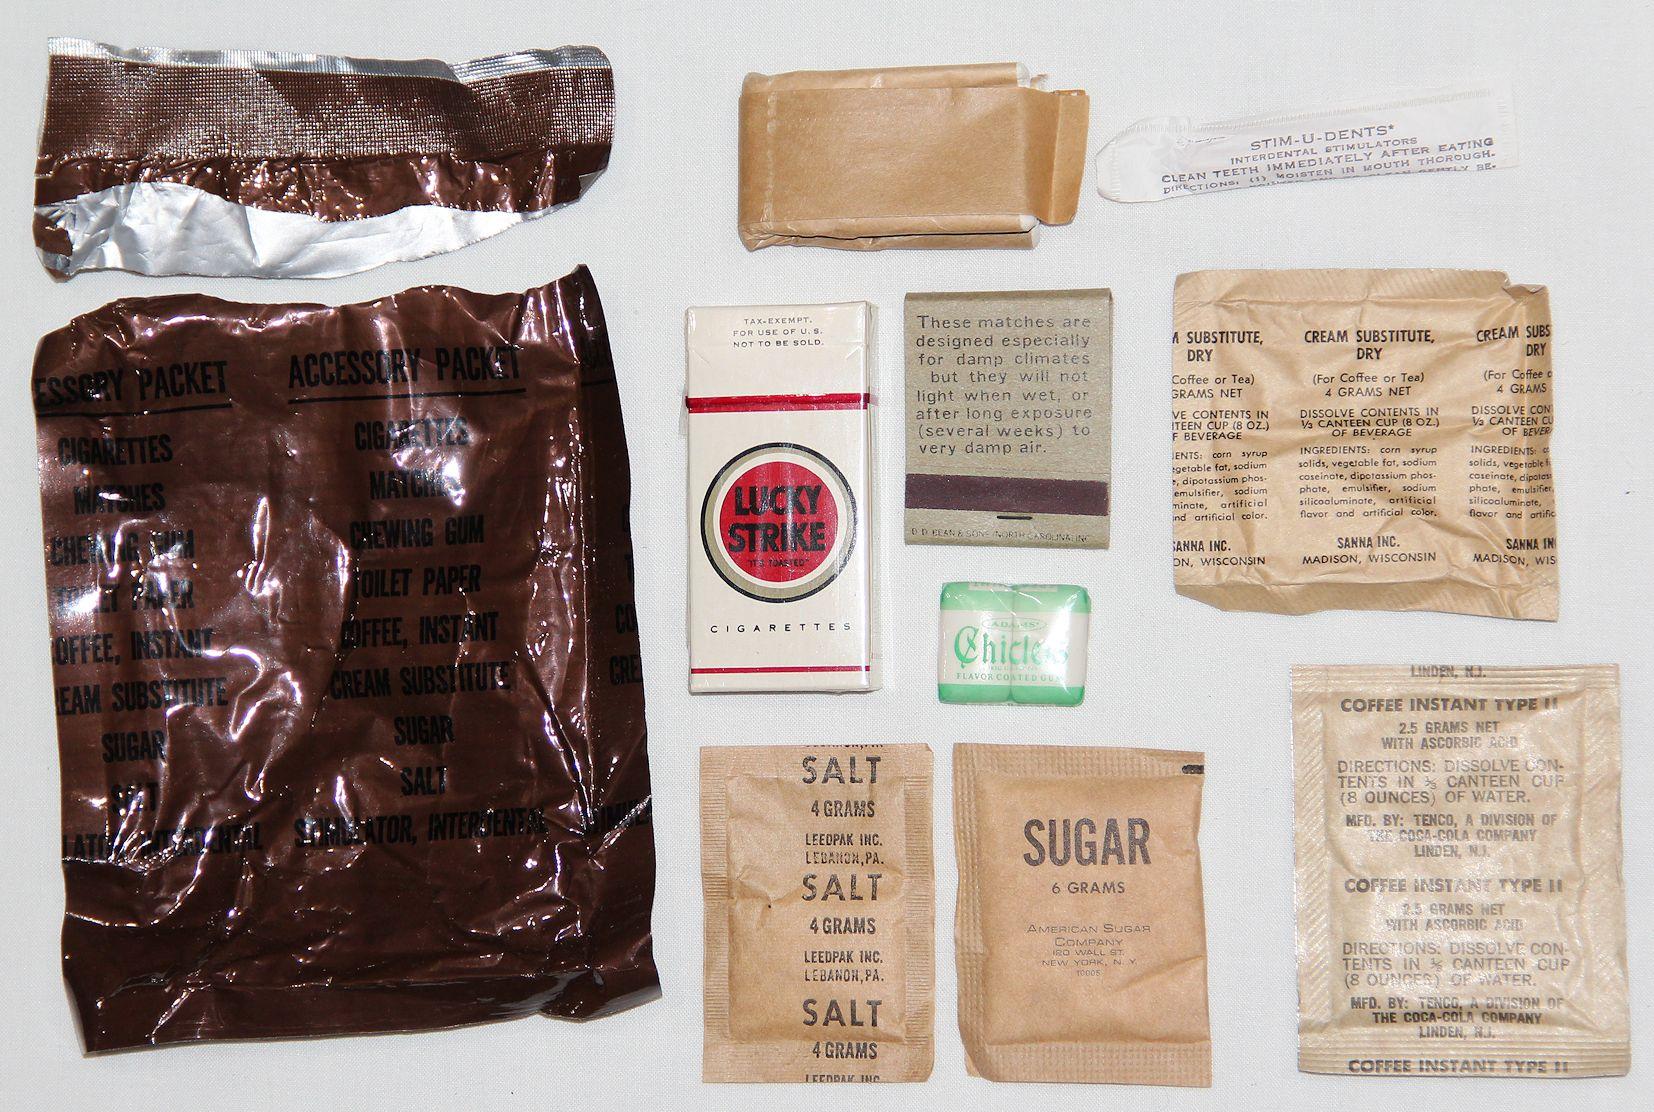 Vietnam C Ration Accessory Pack Creamer Substitute Dry